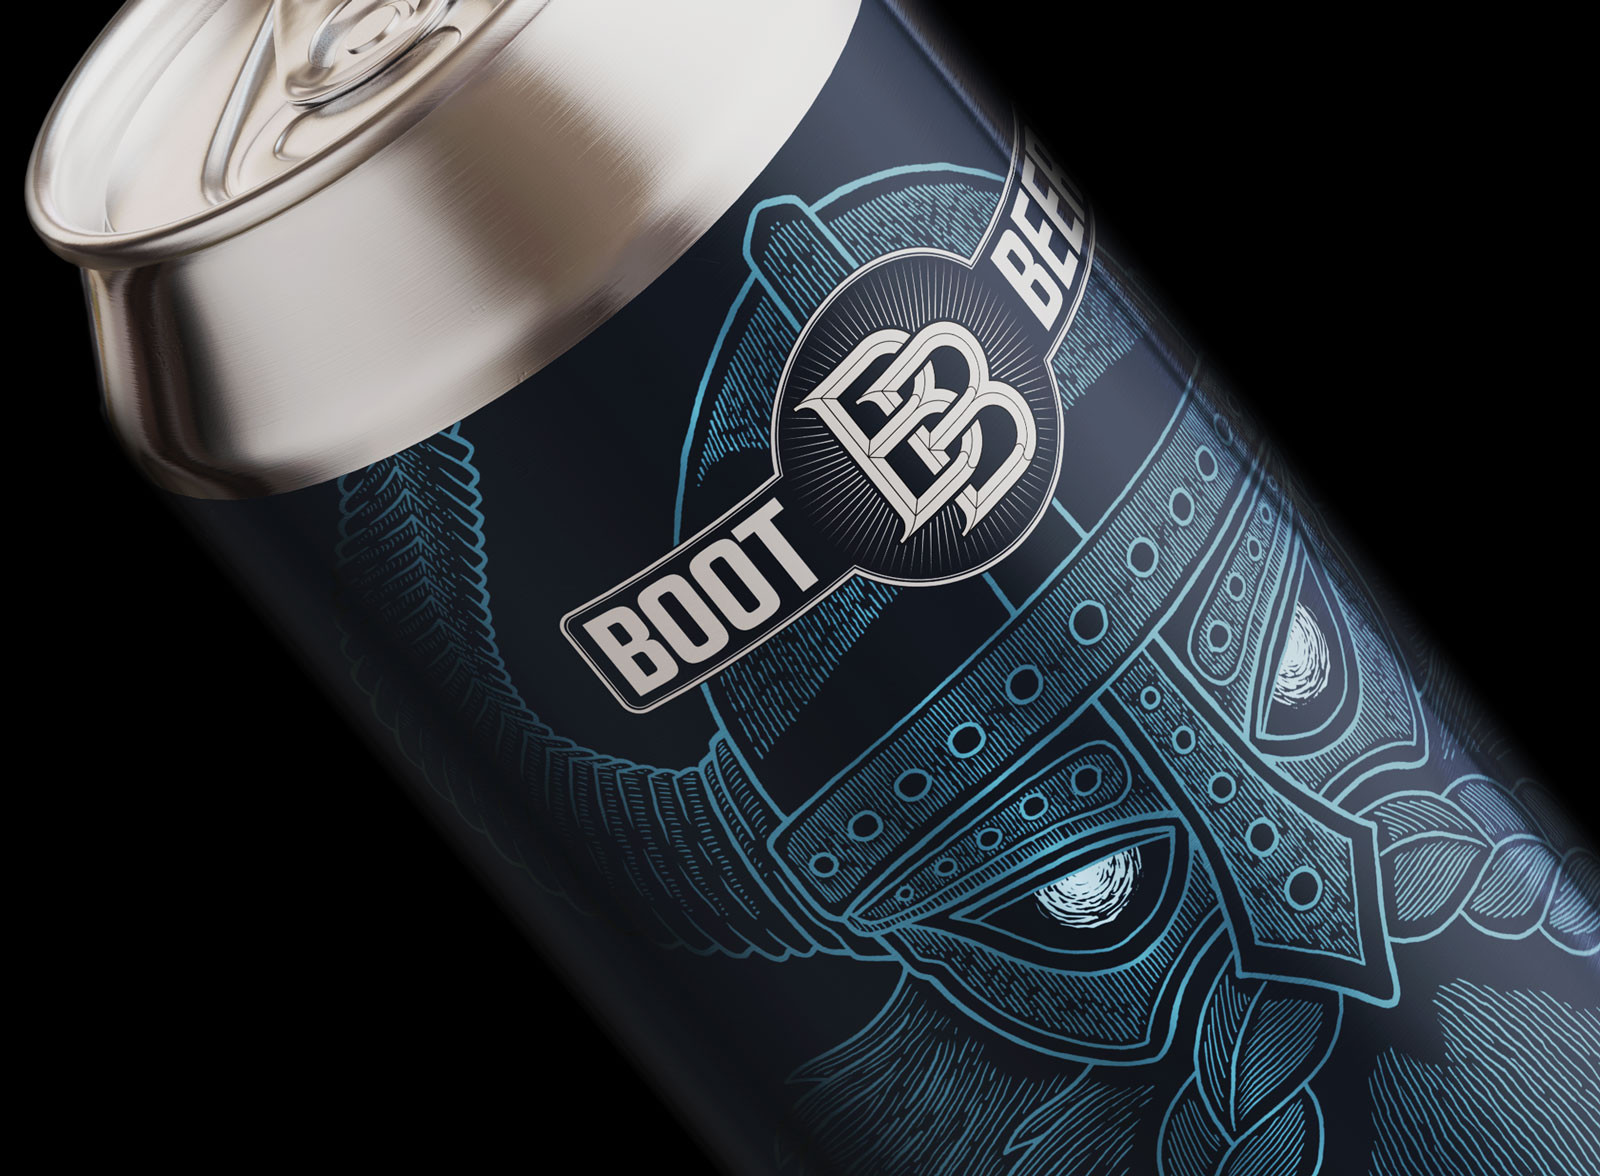 boot-beer-valhalla-beer-label-viking-clo